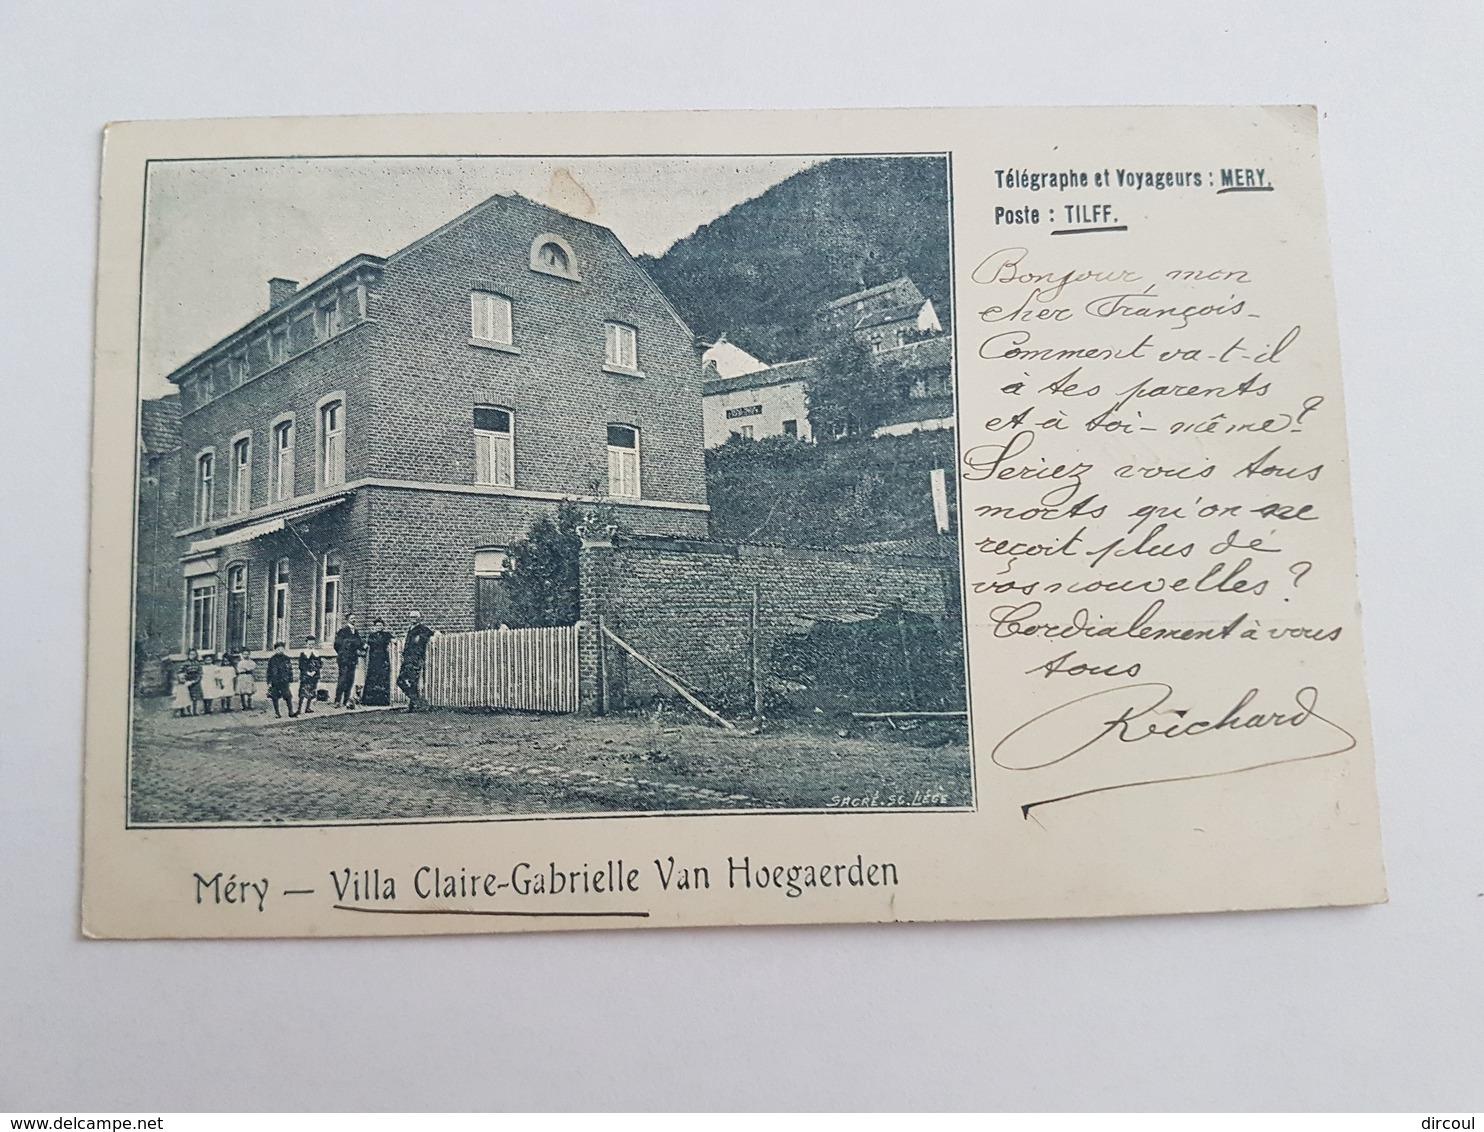 40278  -   Méry  Tillf  Villa  Claire-Gabrielle  Van  Hoegaerden - Esneux